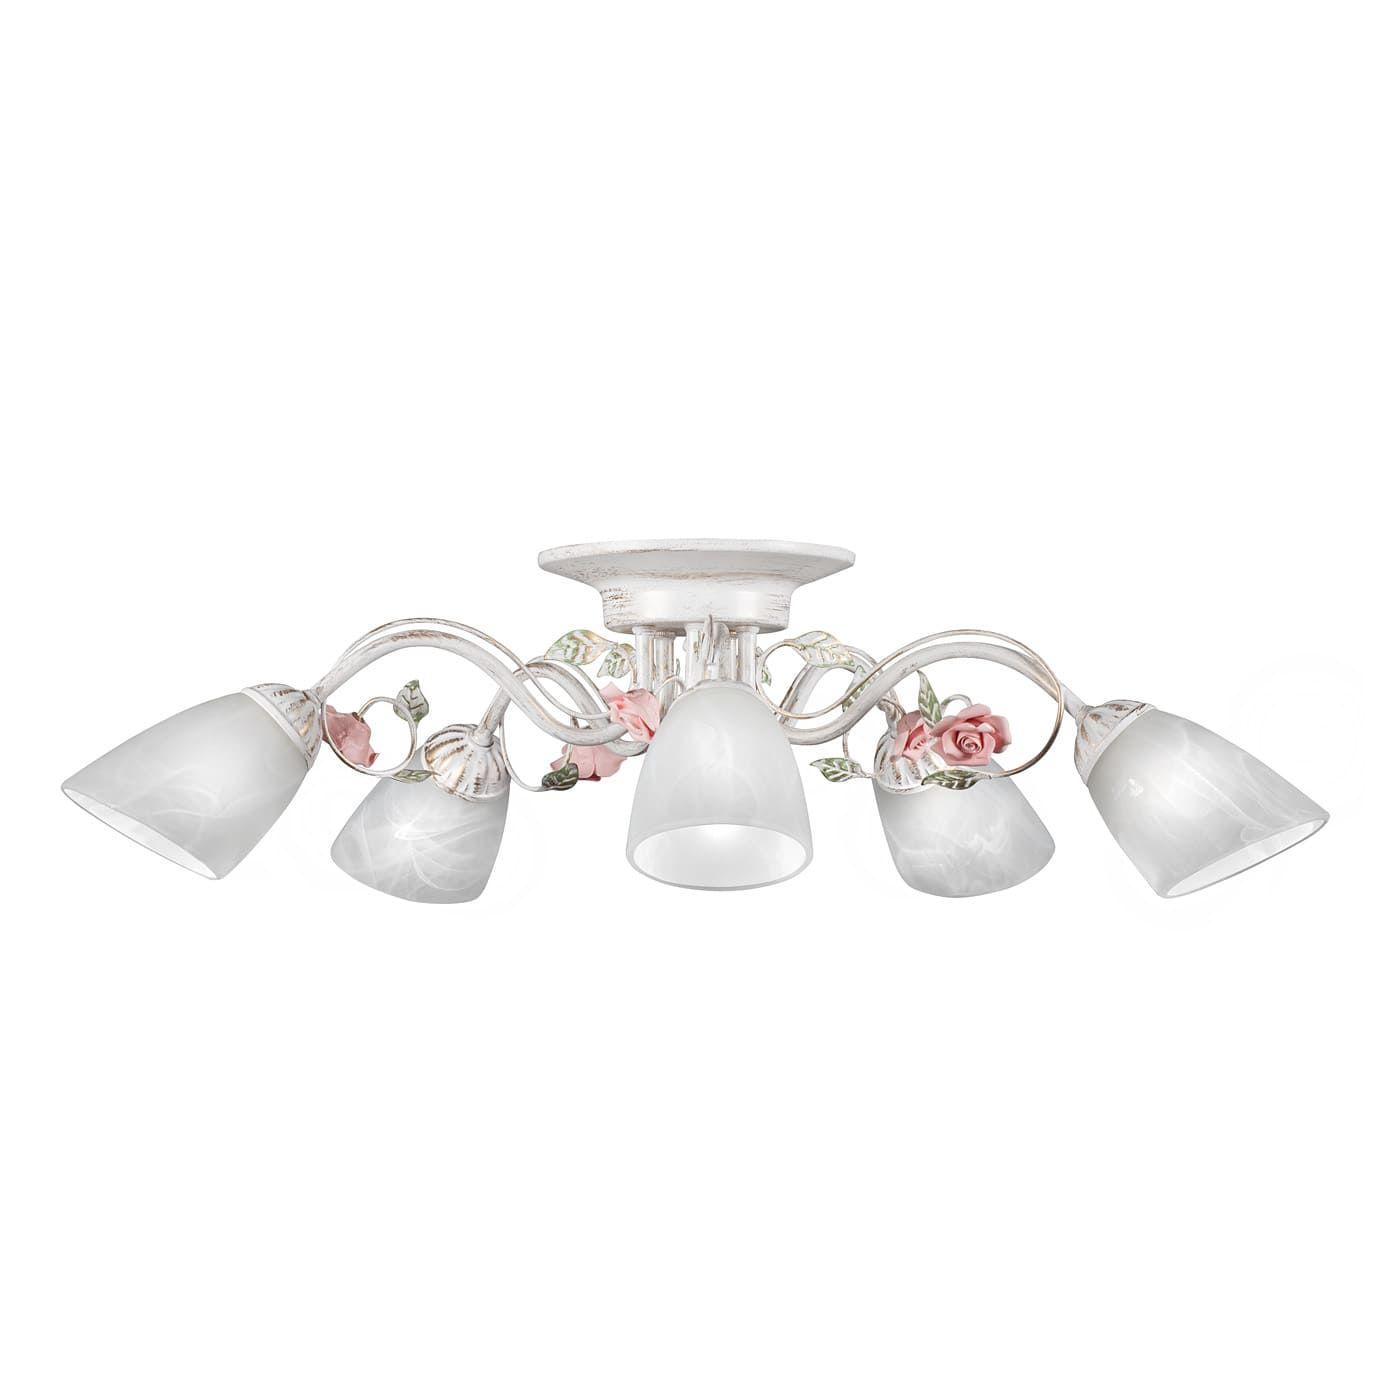 PETRASVET / Ceiling chandelier S2112, 5xE14 max. 60W